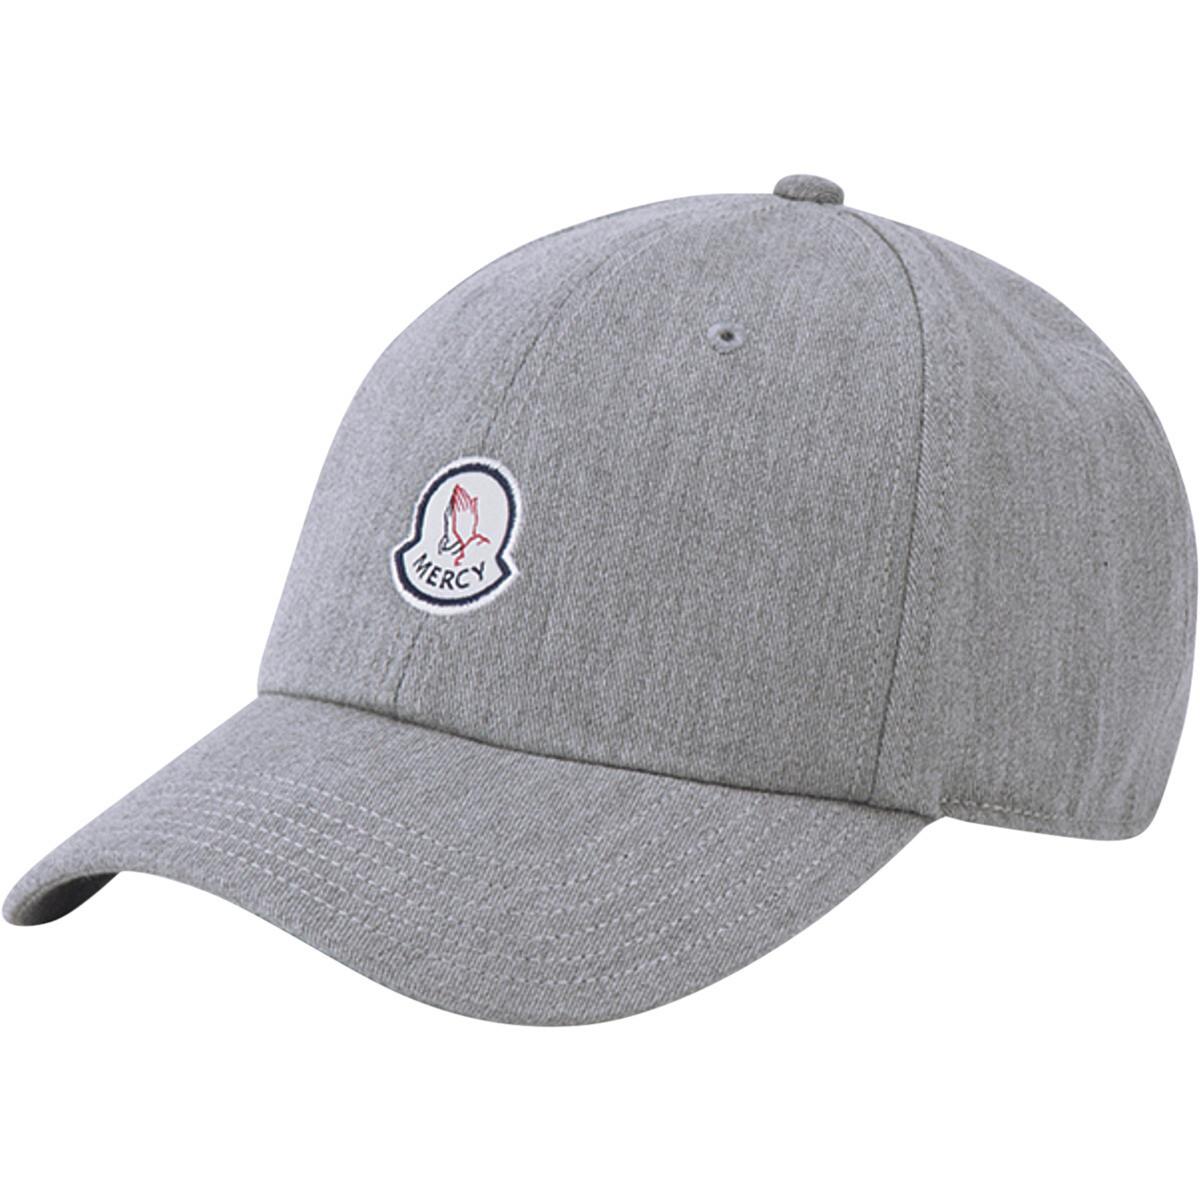 C&S WL Mont Mercy Curved Cap